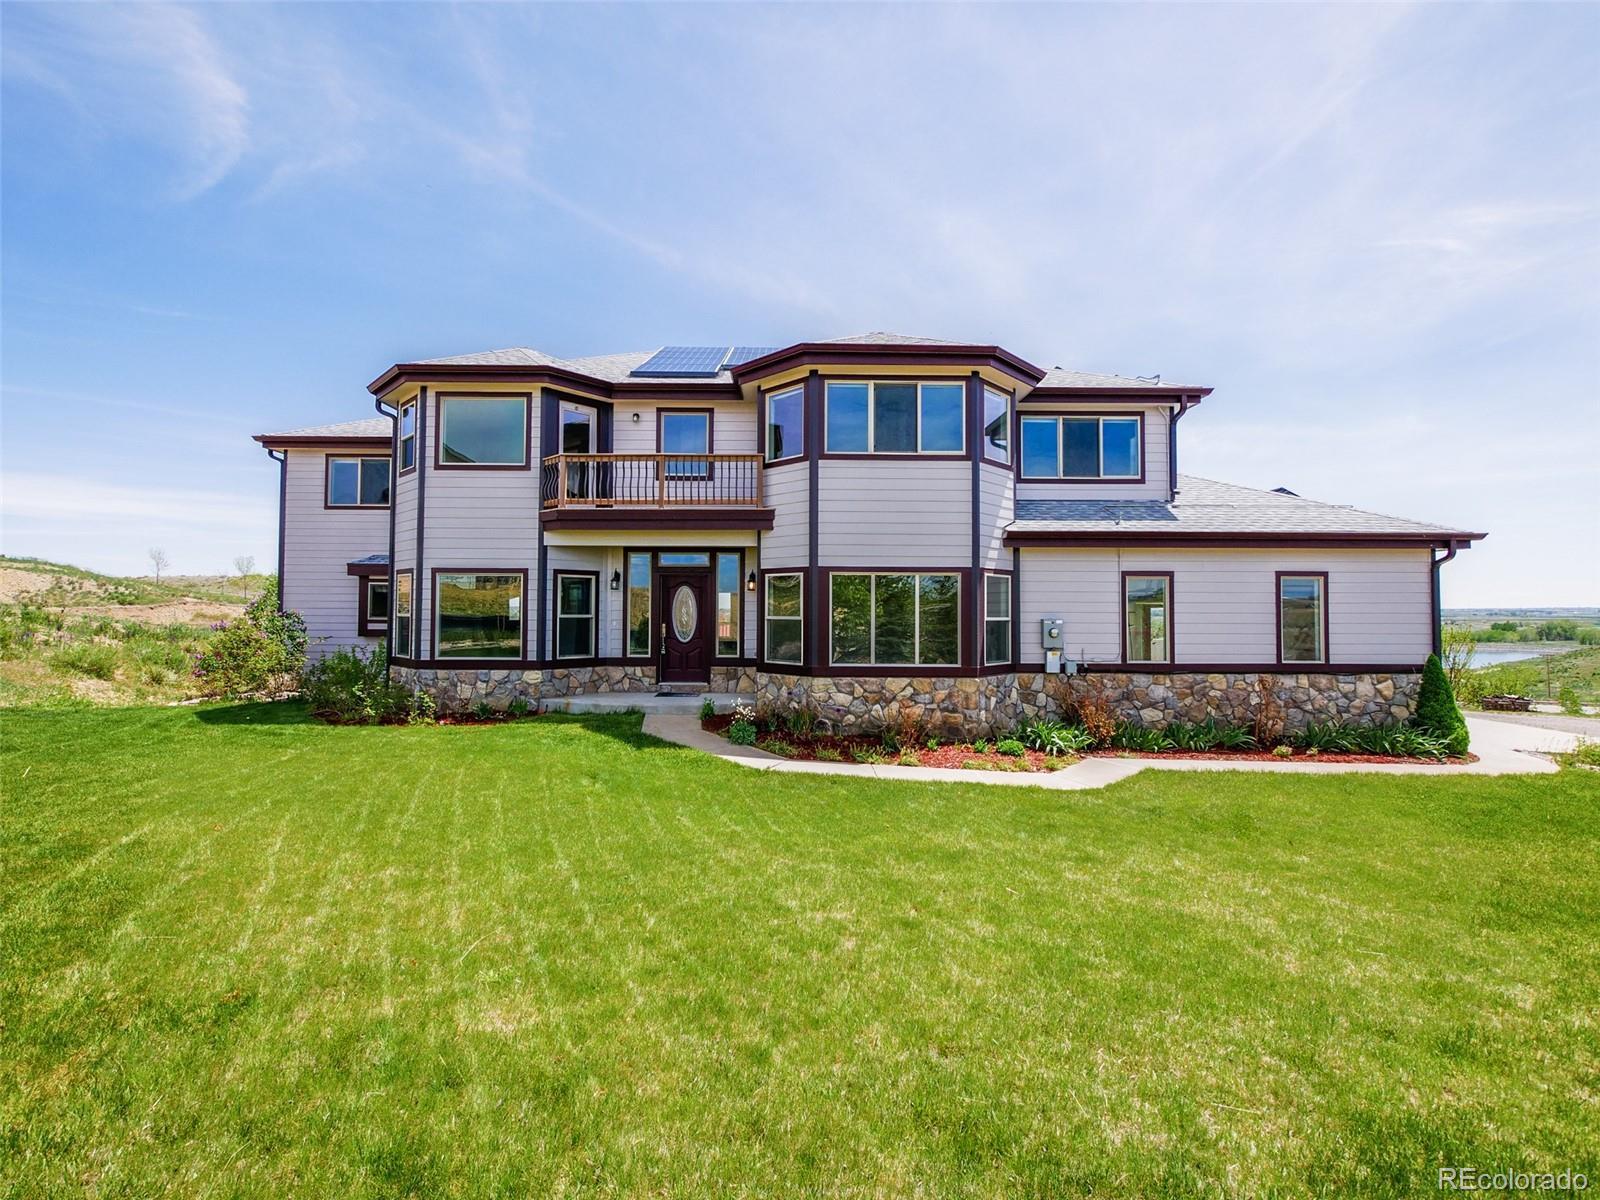 10381 E 142nd Avenue Property Photo - Thornton, CO real estate listing